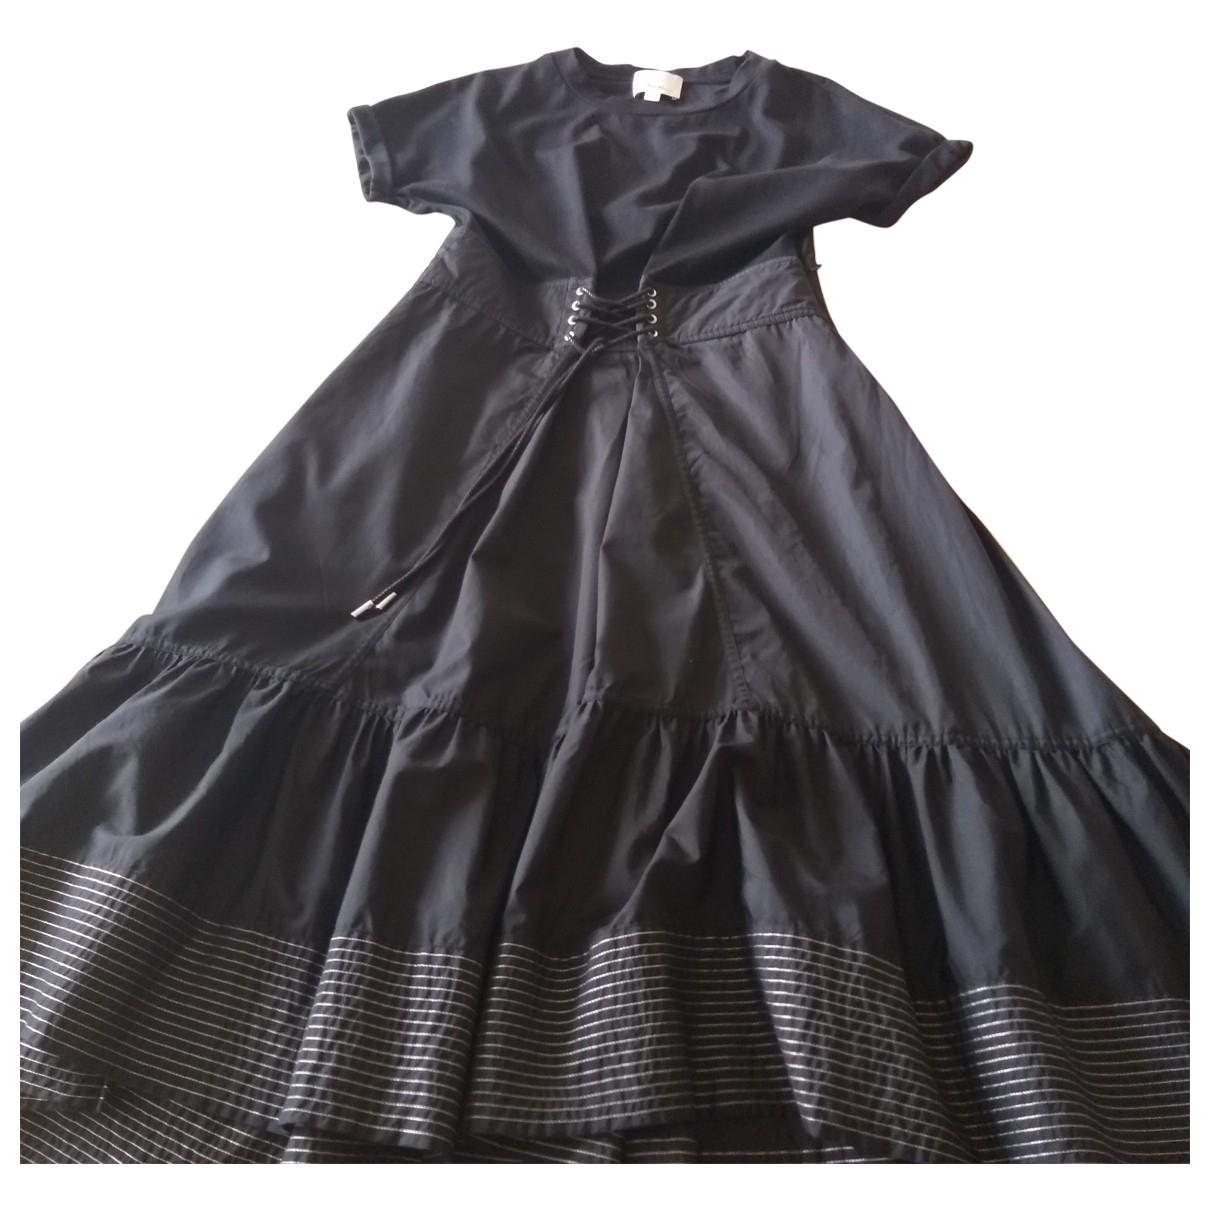 3.1 Phillip Lim \N Black Cotton dress for Women S International